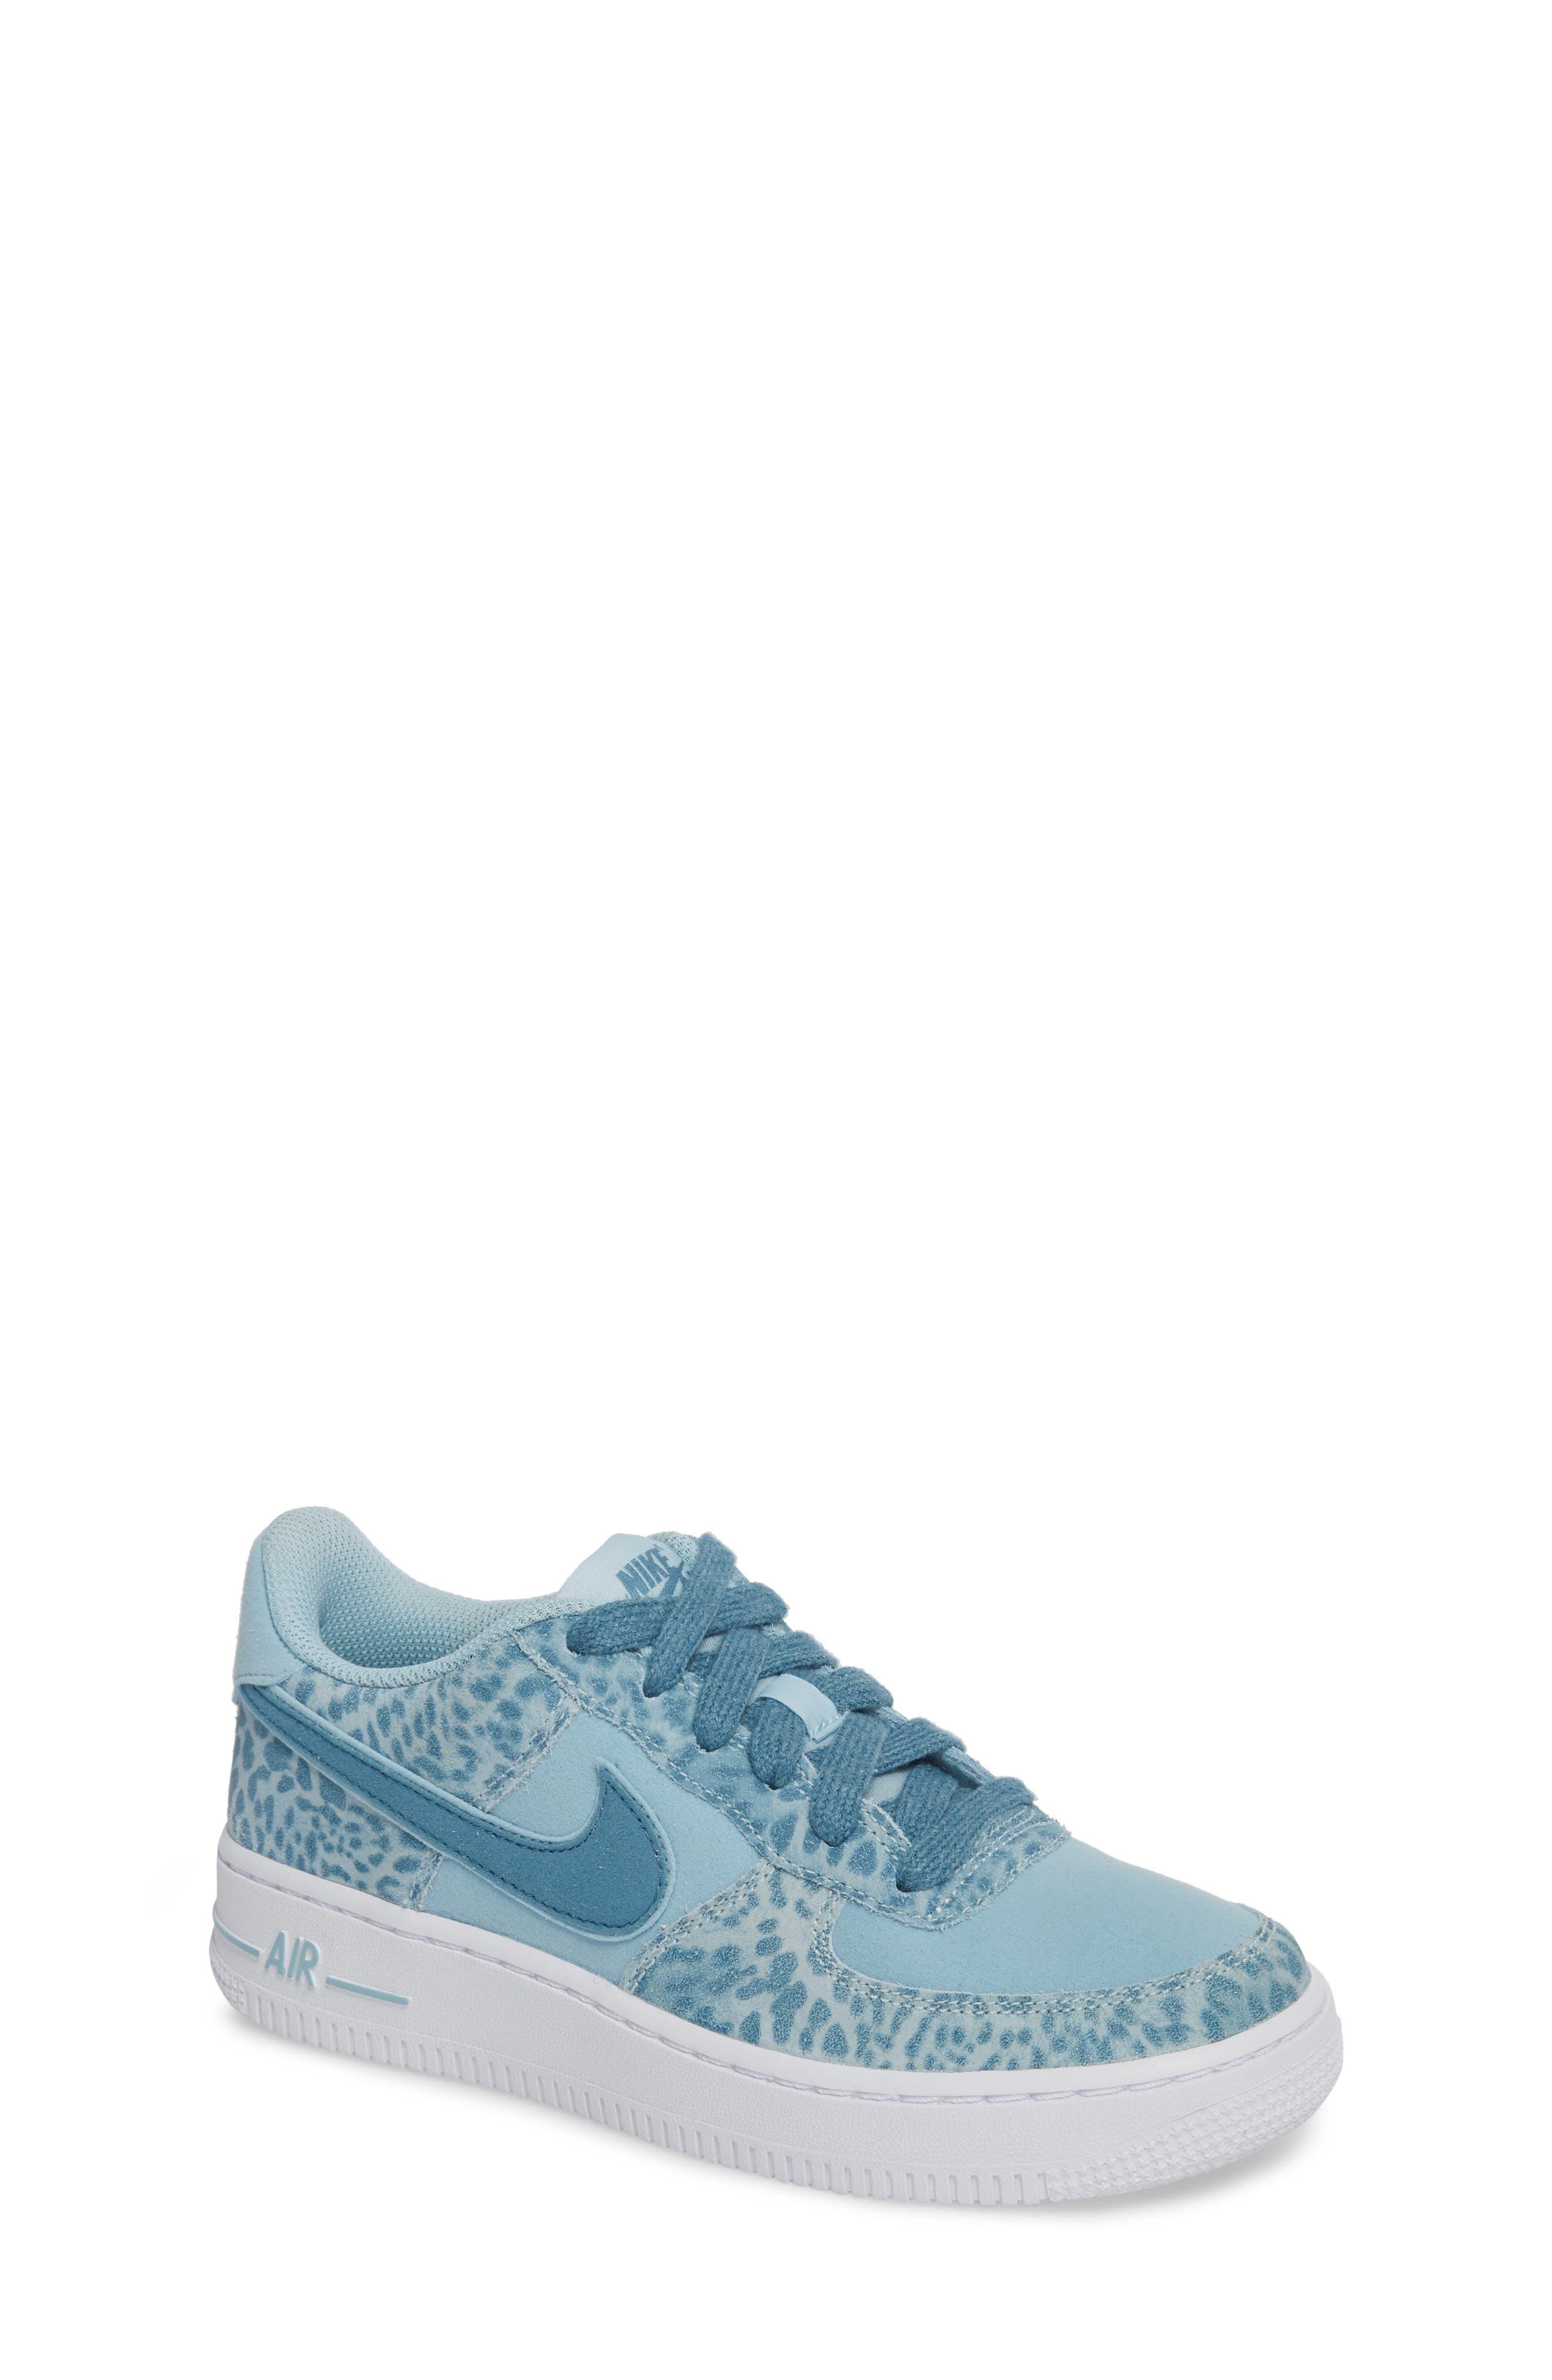 Air Force 1 LV8 Sneaker,                             Main thumbnail 1, color,                             OCEAN BLISS/ NOISE AQUA/ WHITE